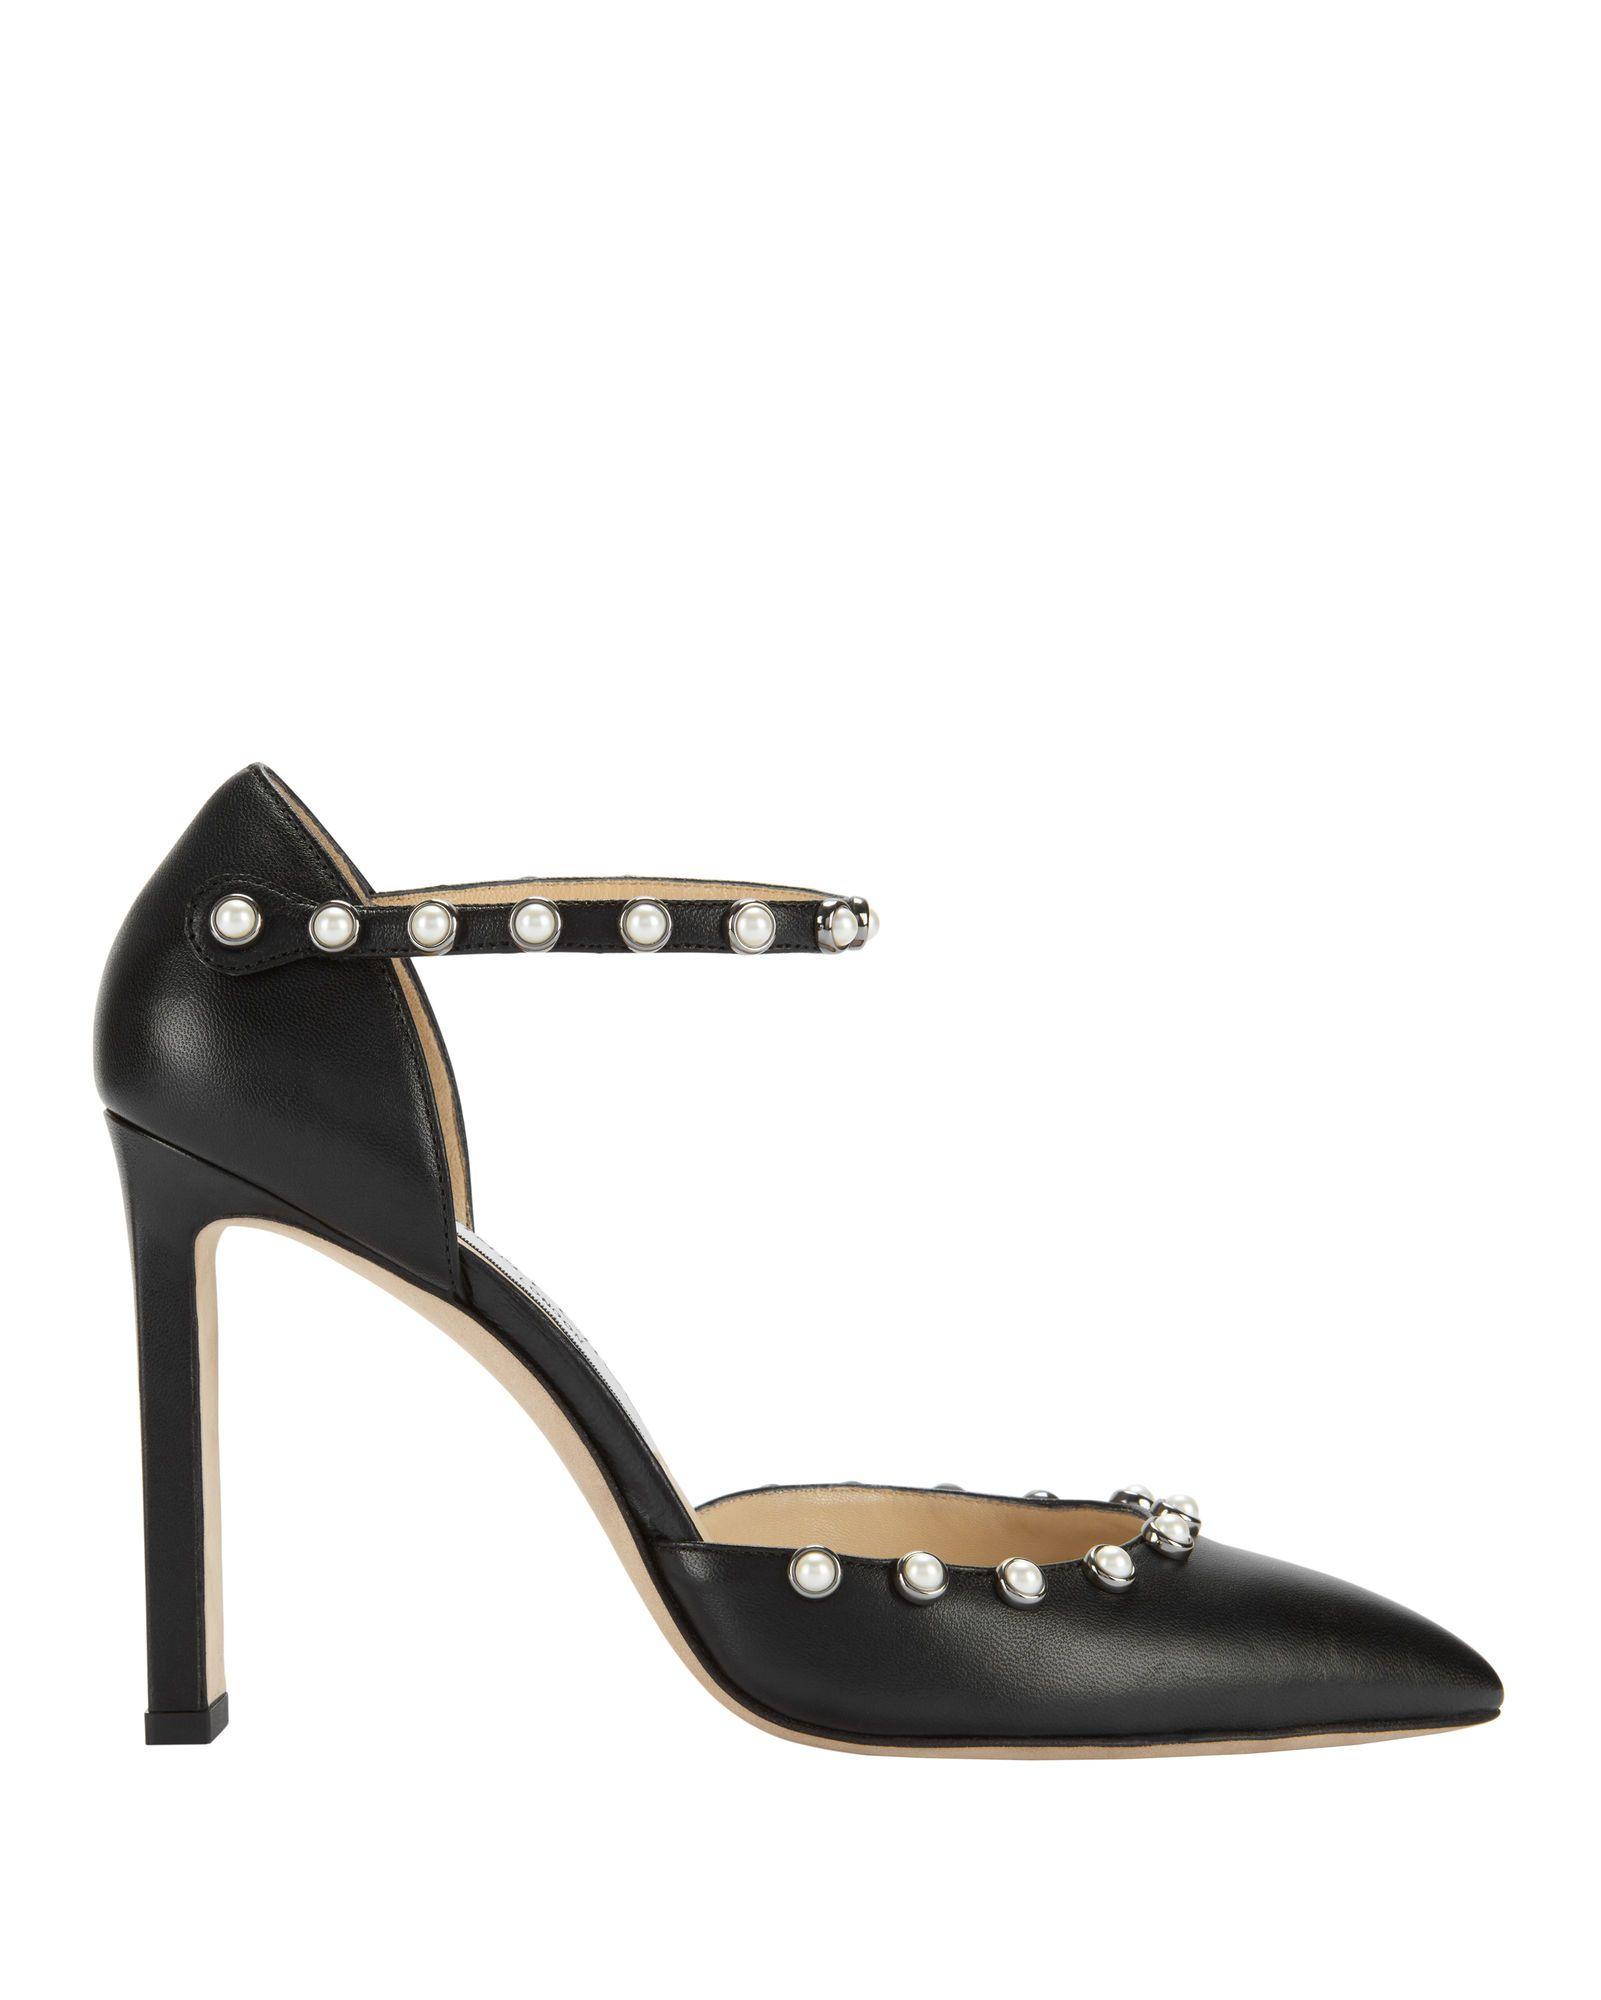 d4a55ba803e JIMMY CHOO Leema Pearl-Studded Pumps.  jimmychoo  shoes